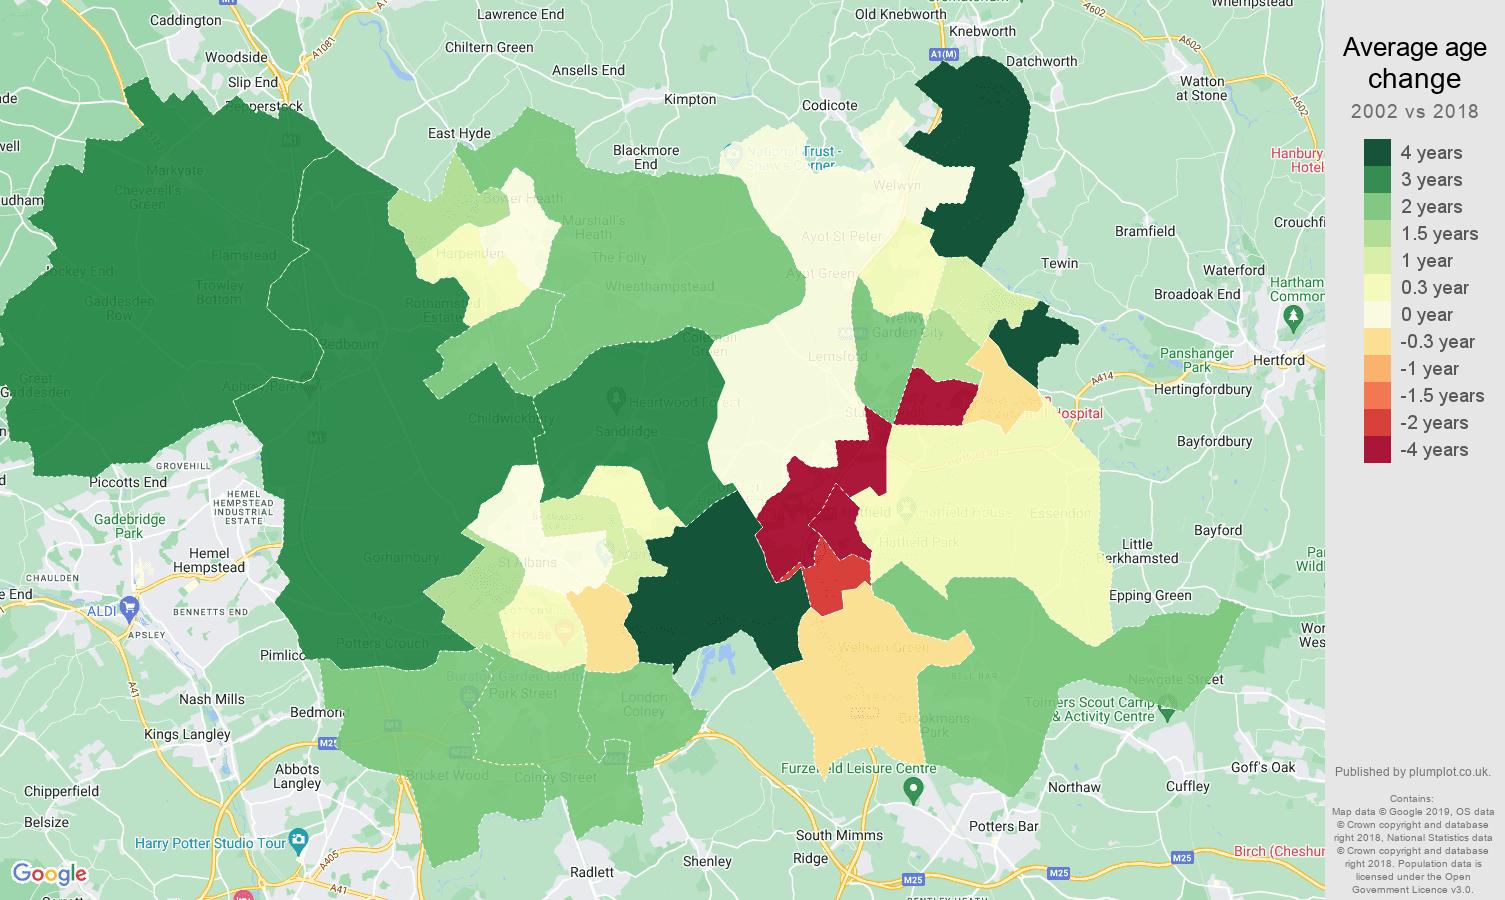 St Albans average age change map